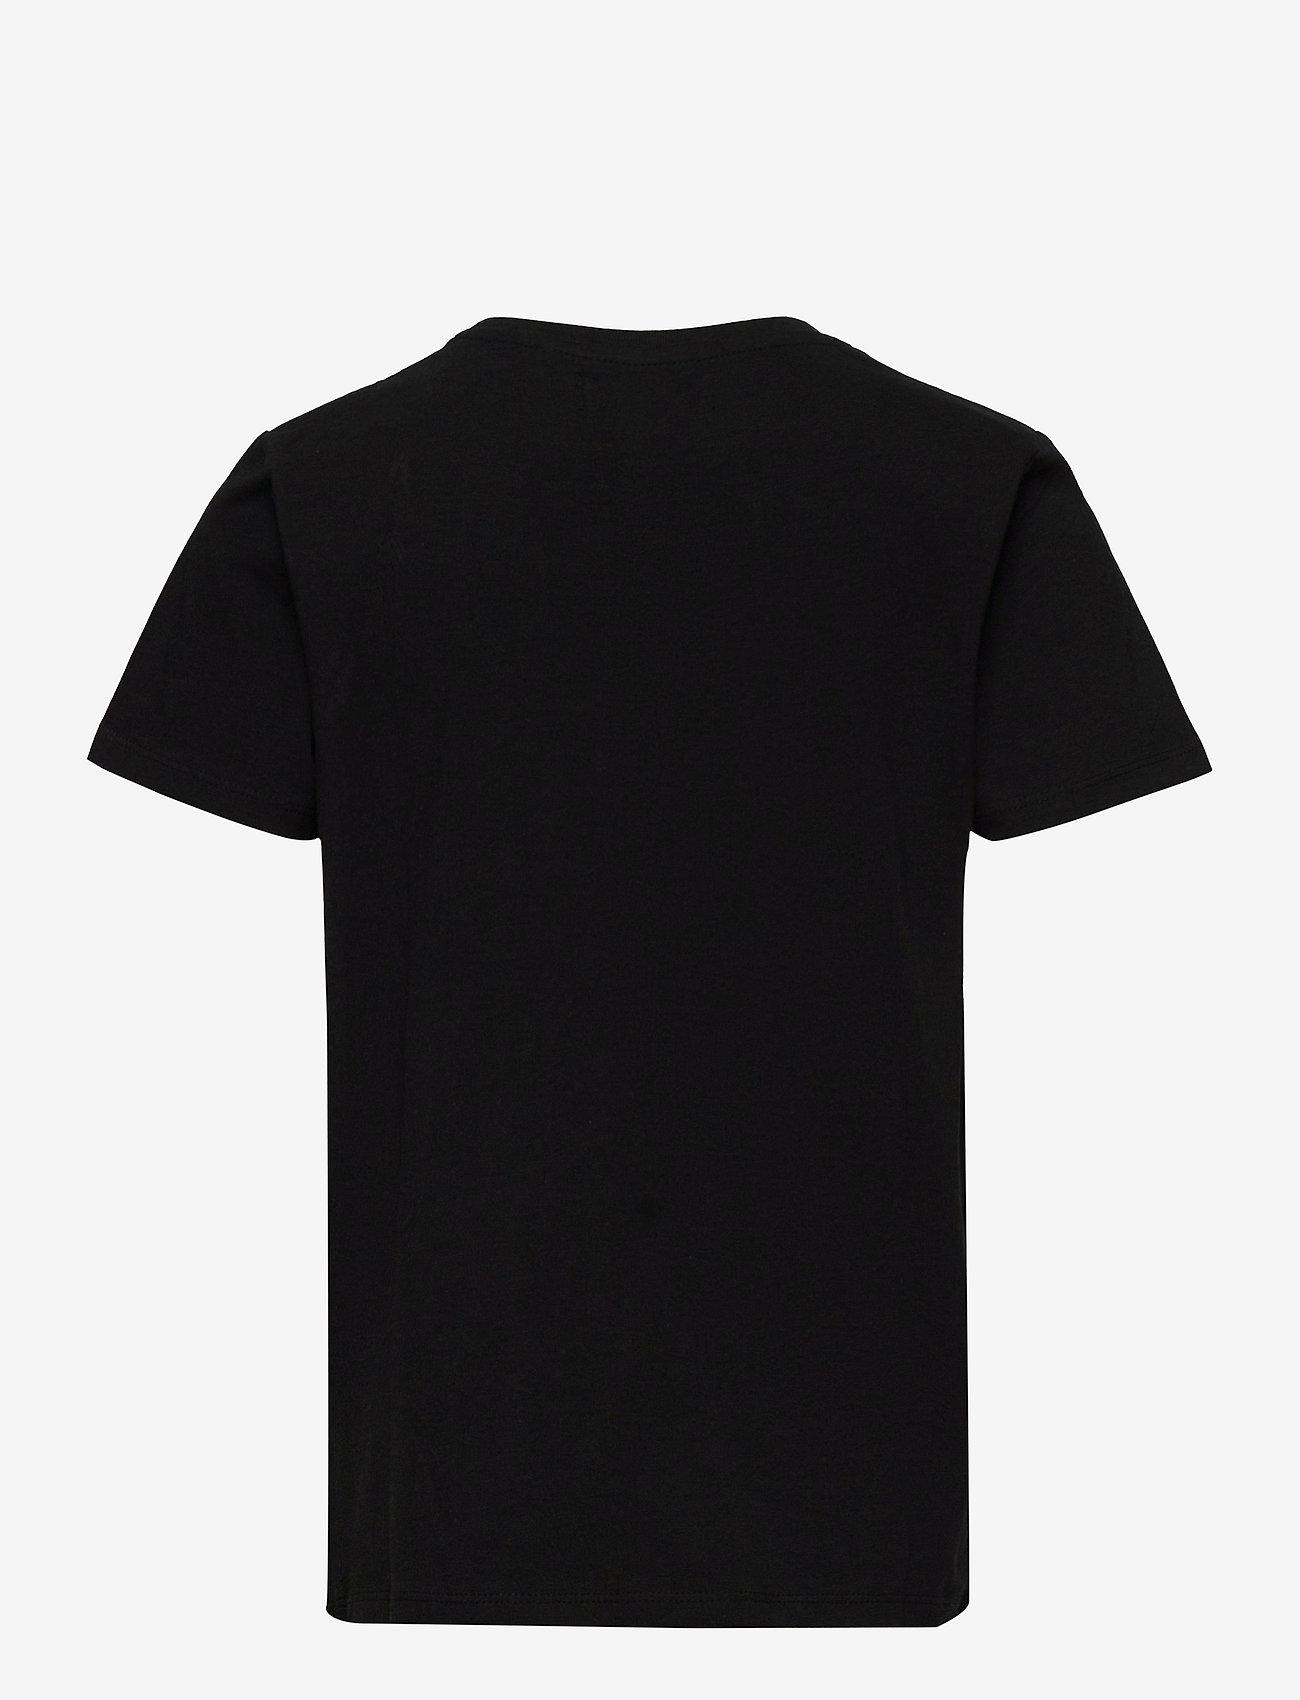 name it - NKMROBLOX MITCHELL SS TOP BOX BIO - t-shirts - black - 1